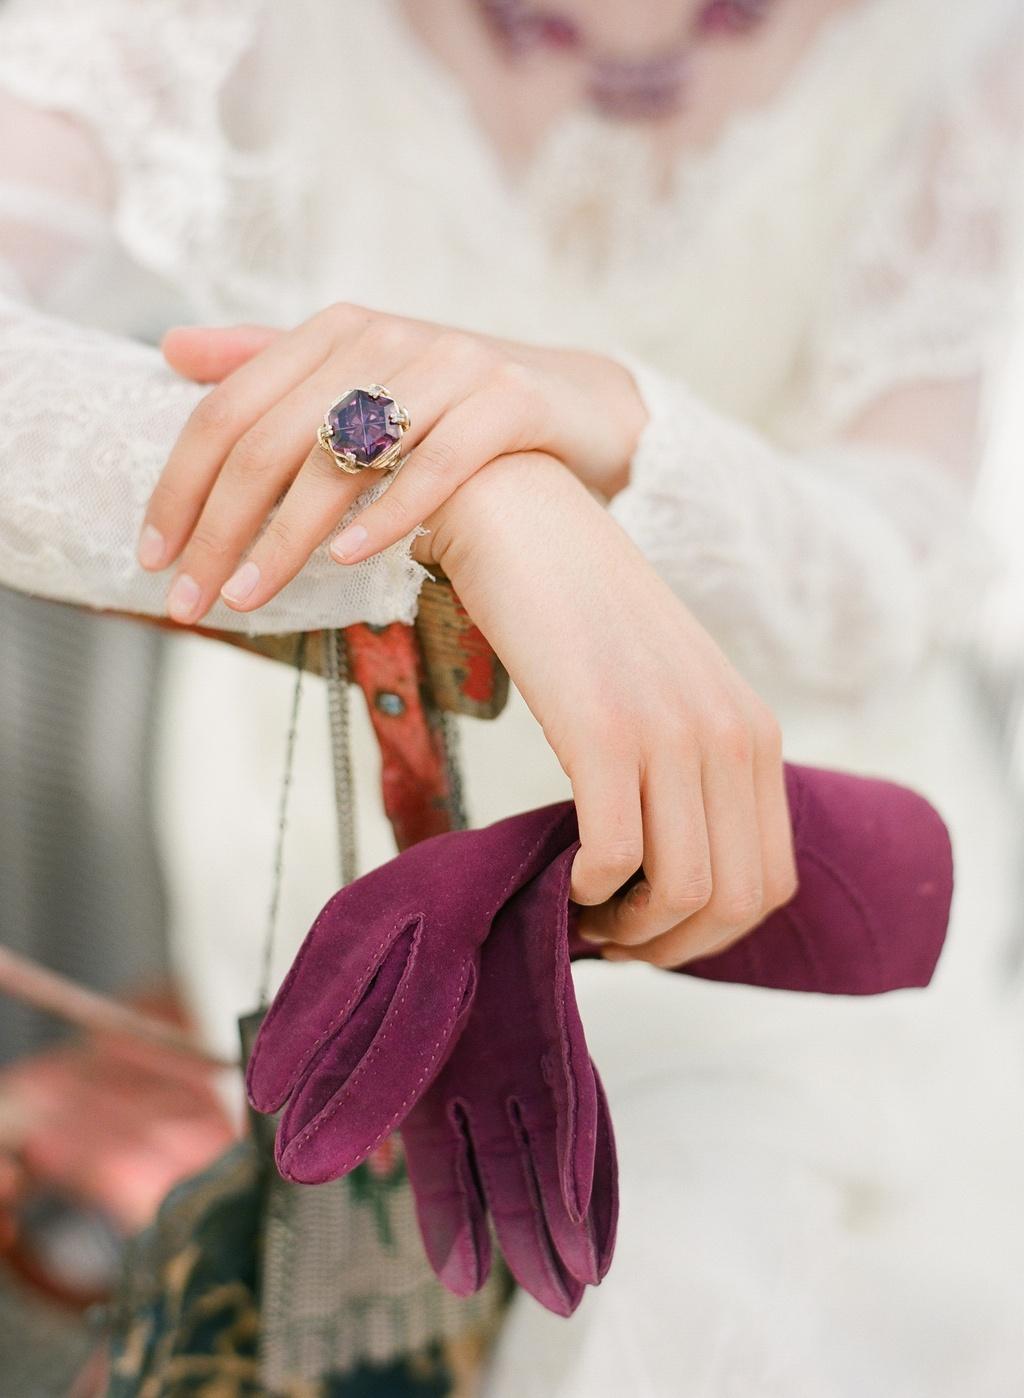 Styled-wedding-beaux-arts-tea-time-monique-lhuillier-santa-barbara-chic-bride-ring-gloves-29.full